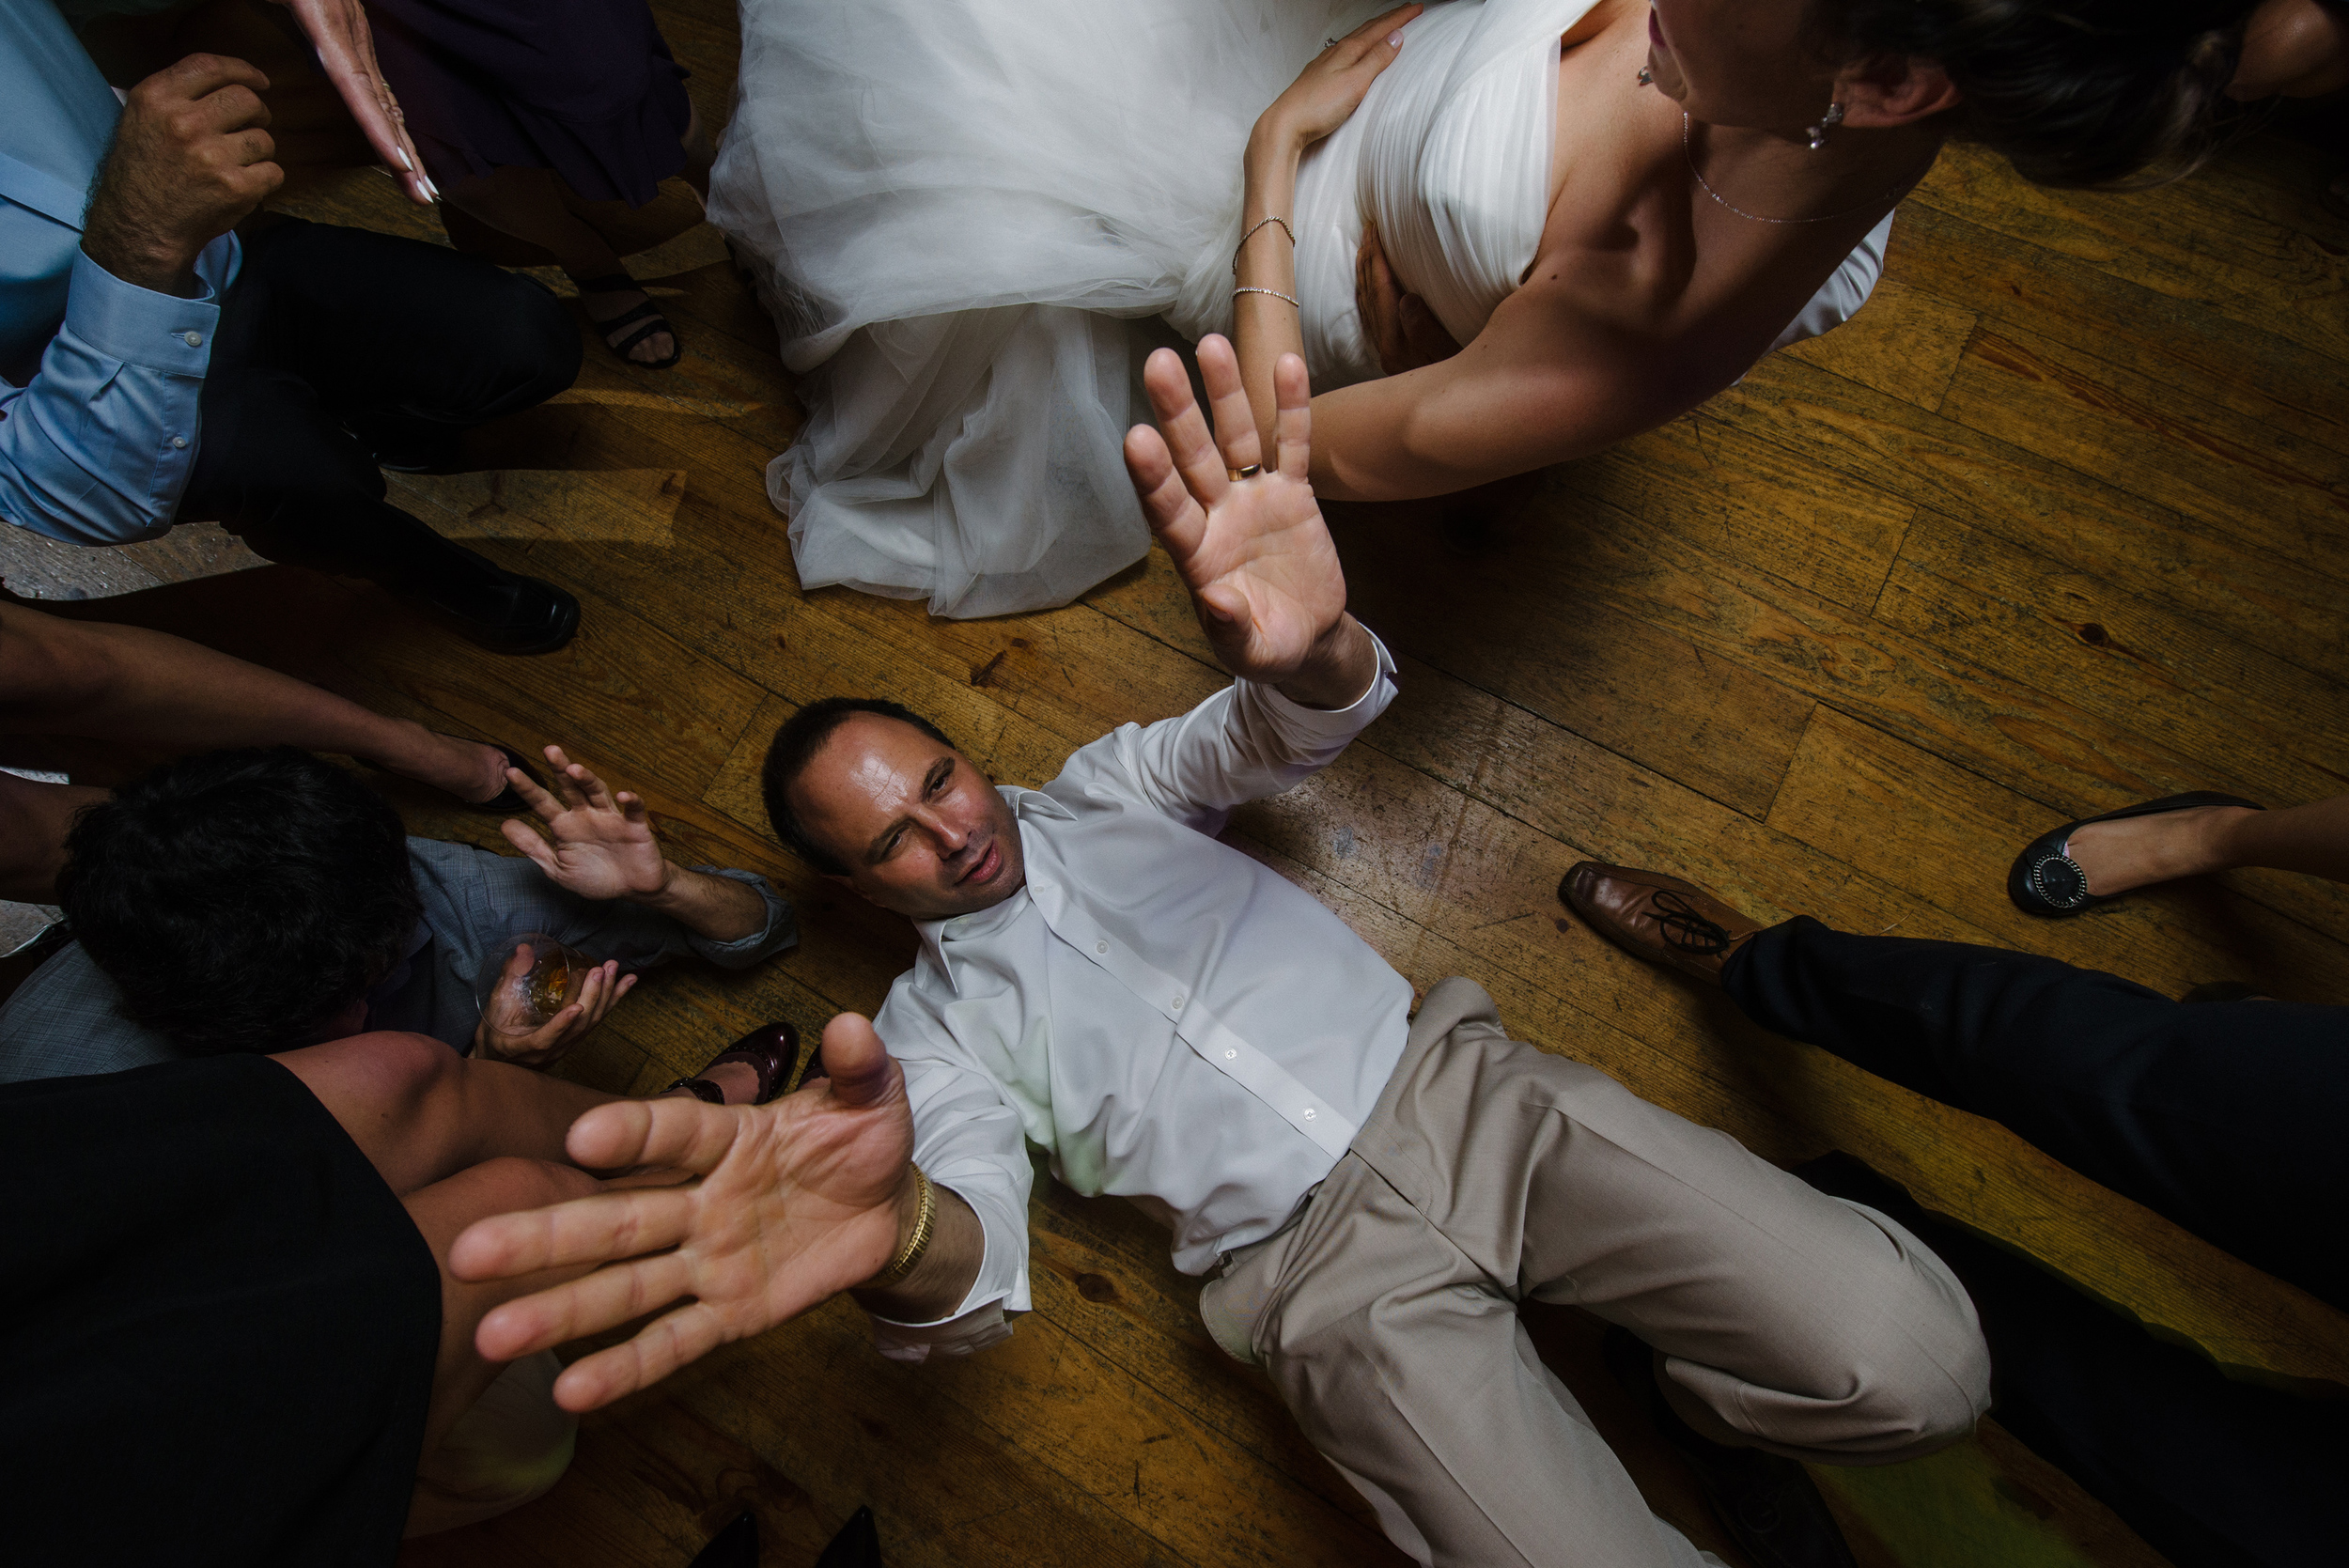 Matt_Swetel_Photography_Erin_and_Jeff_married049.jpg